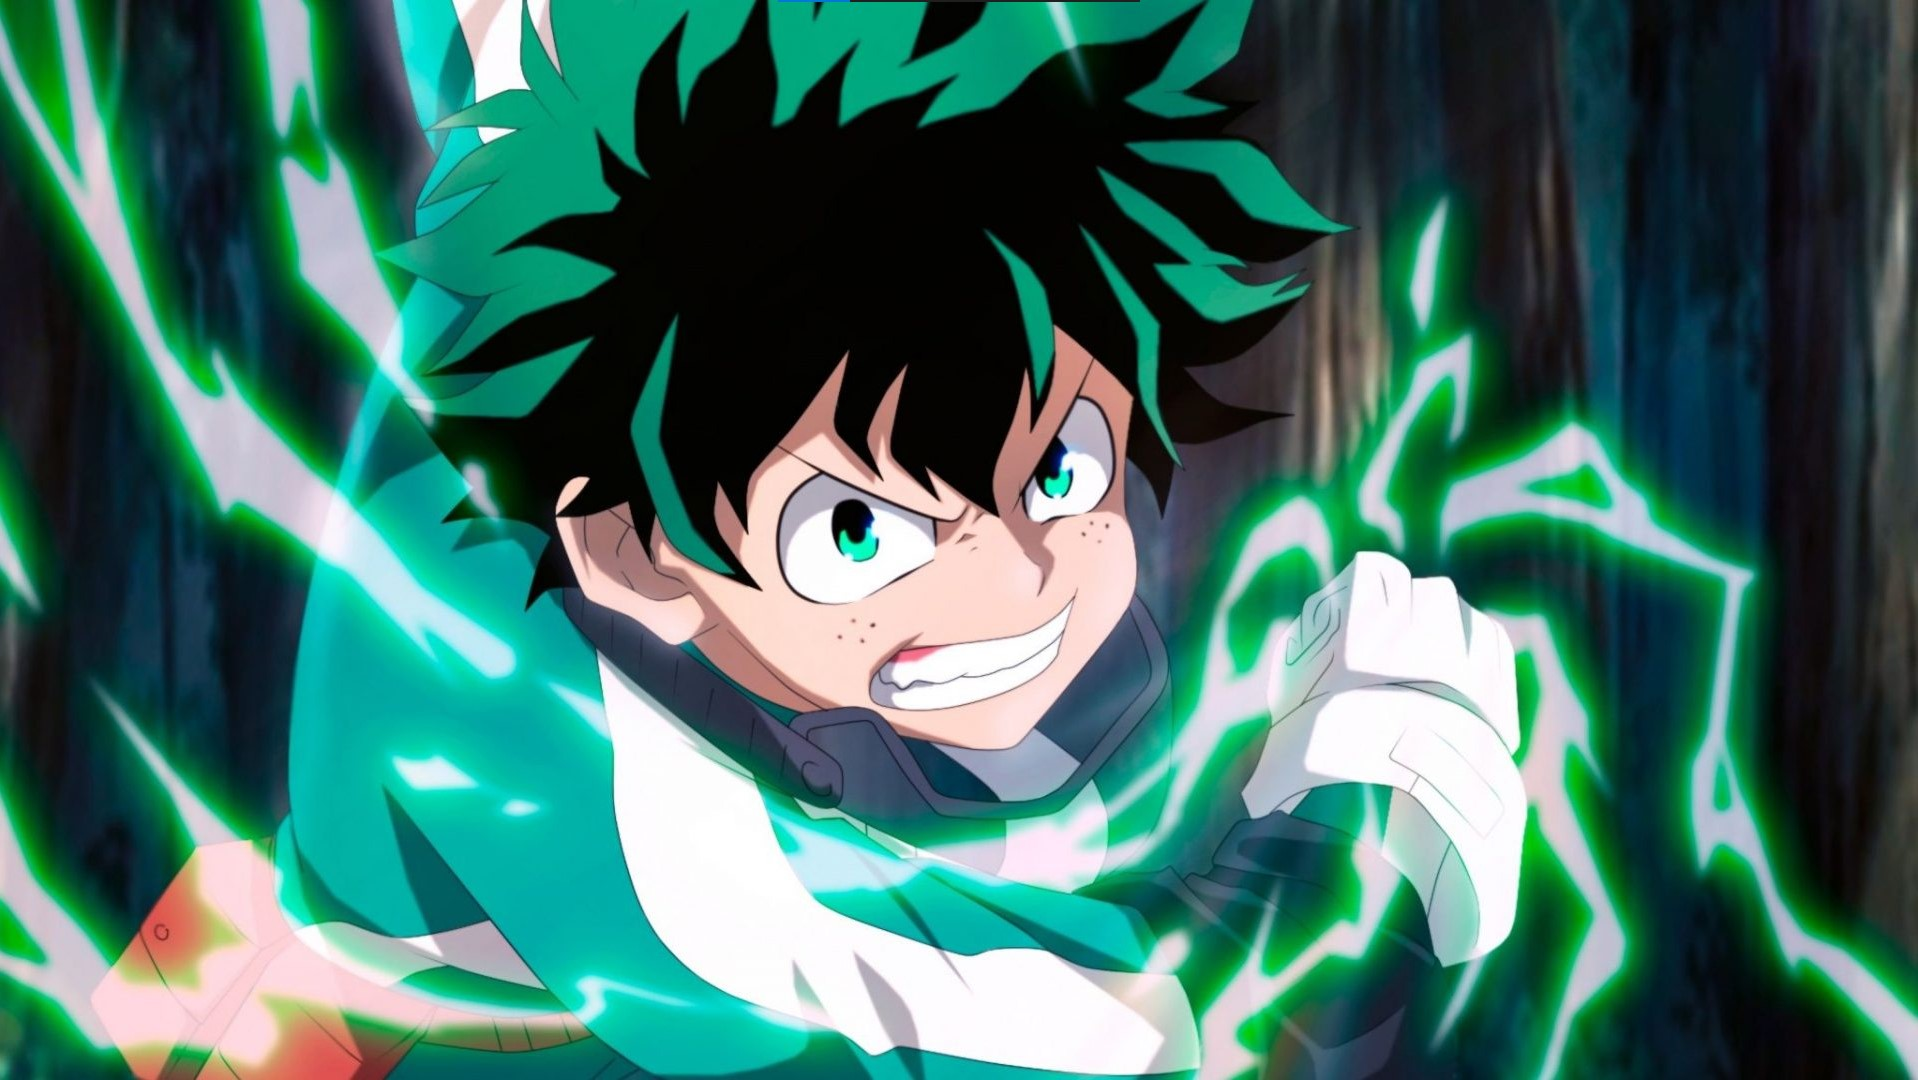 My Hero Academia- anime like black clover/anime similar to black clover